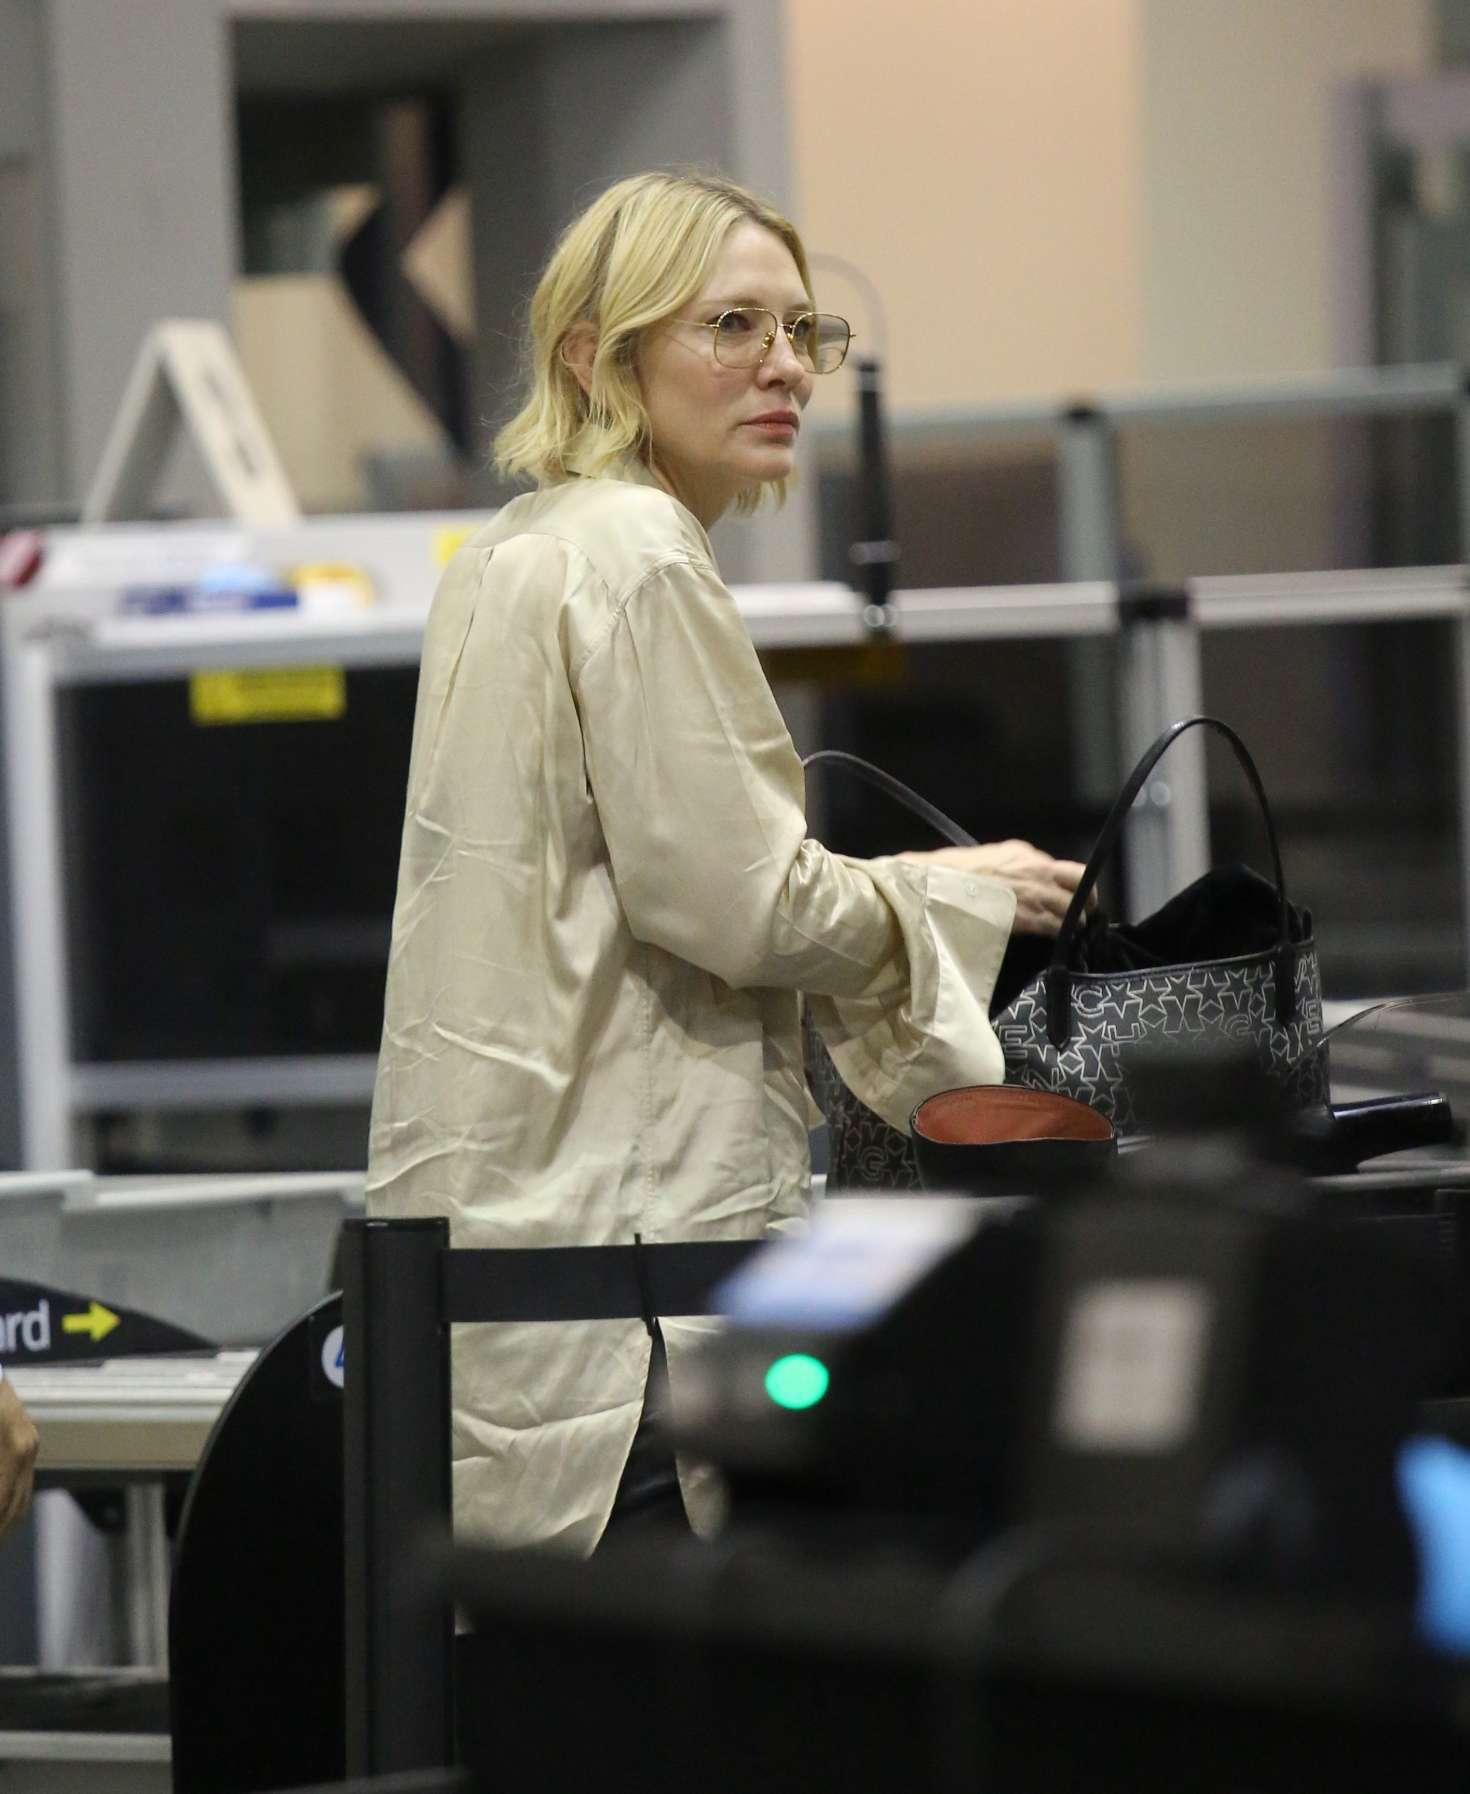 Cate Blanchett 2017 : Cate Blanchett at Los Angeles International Airport -20